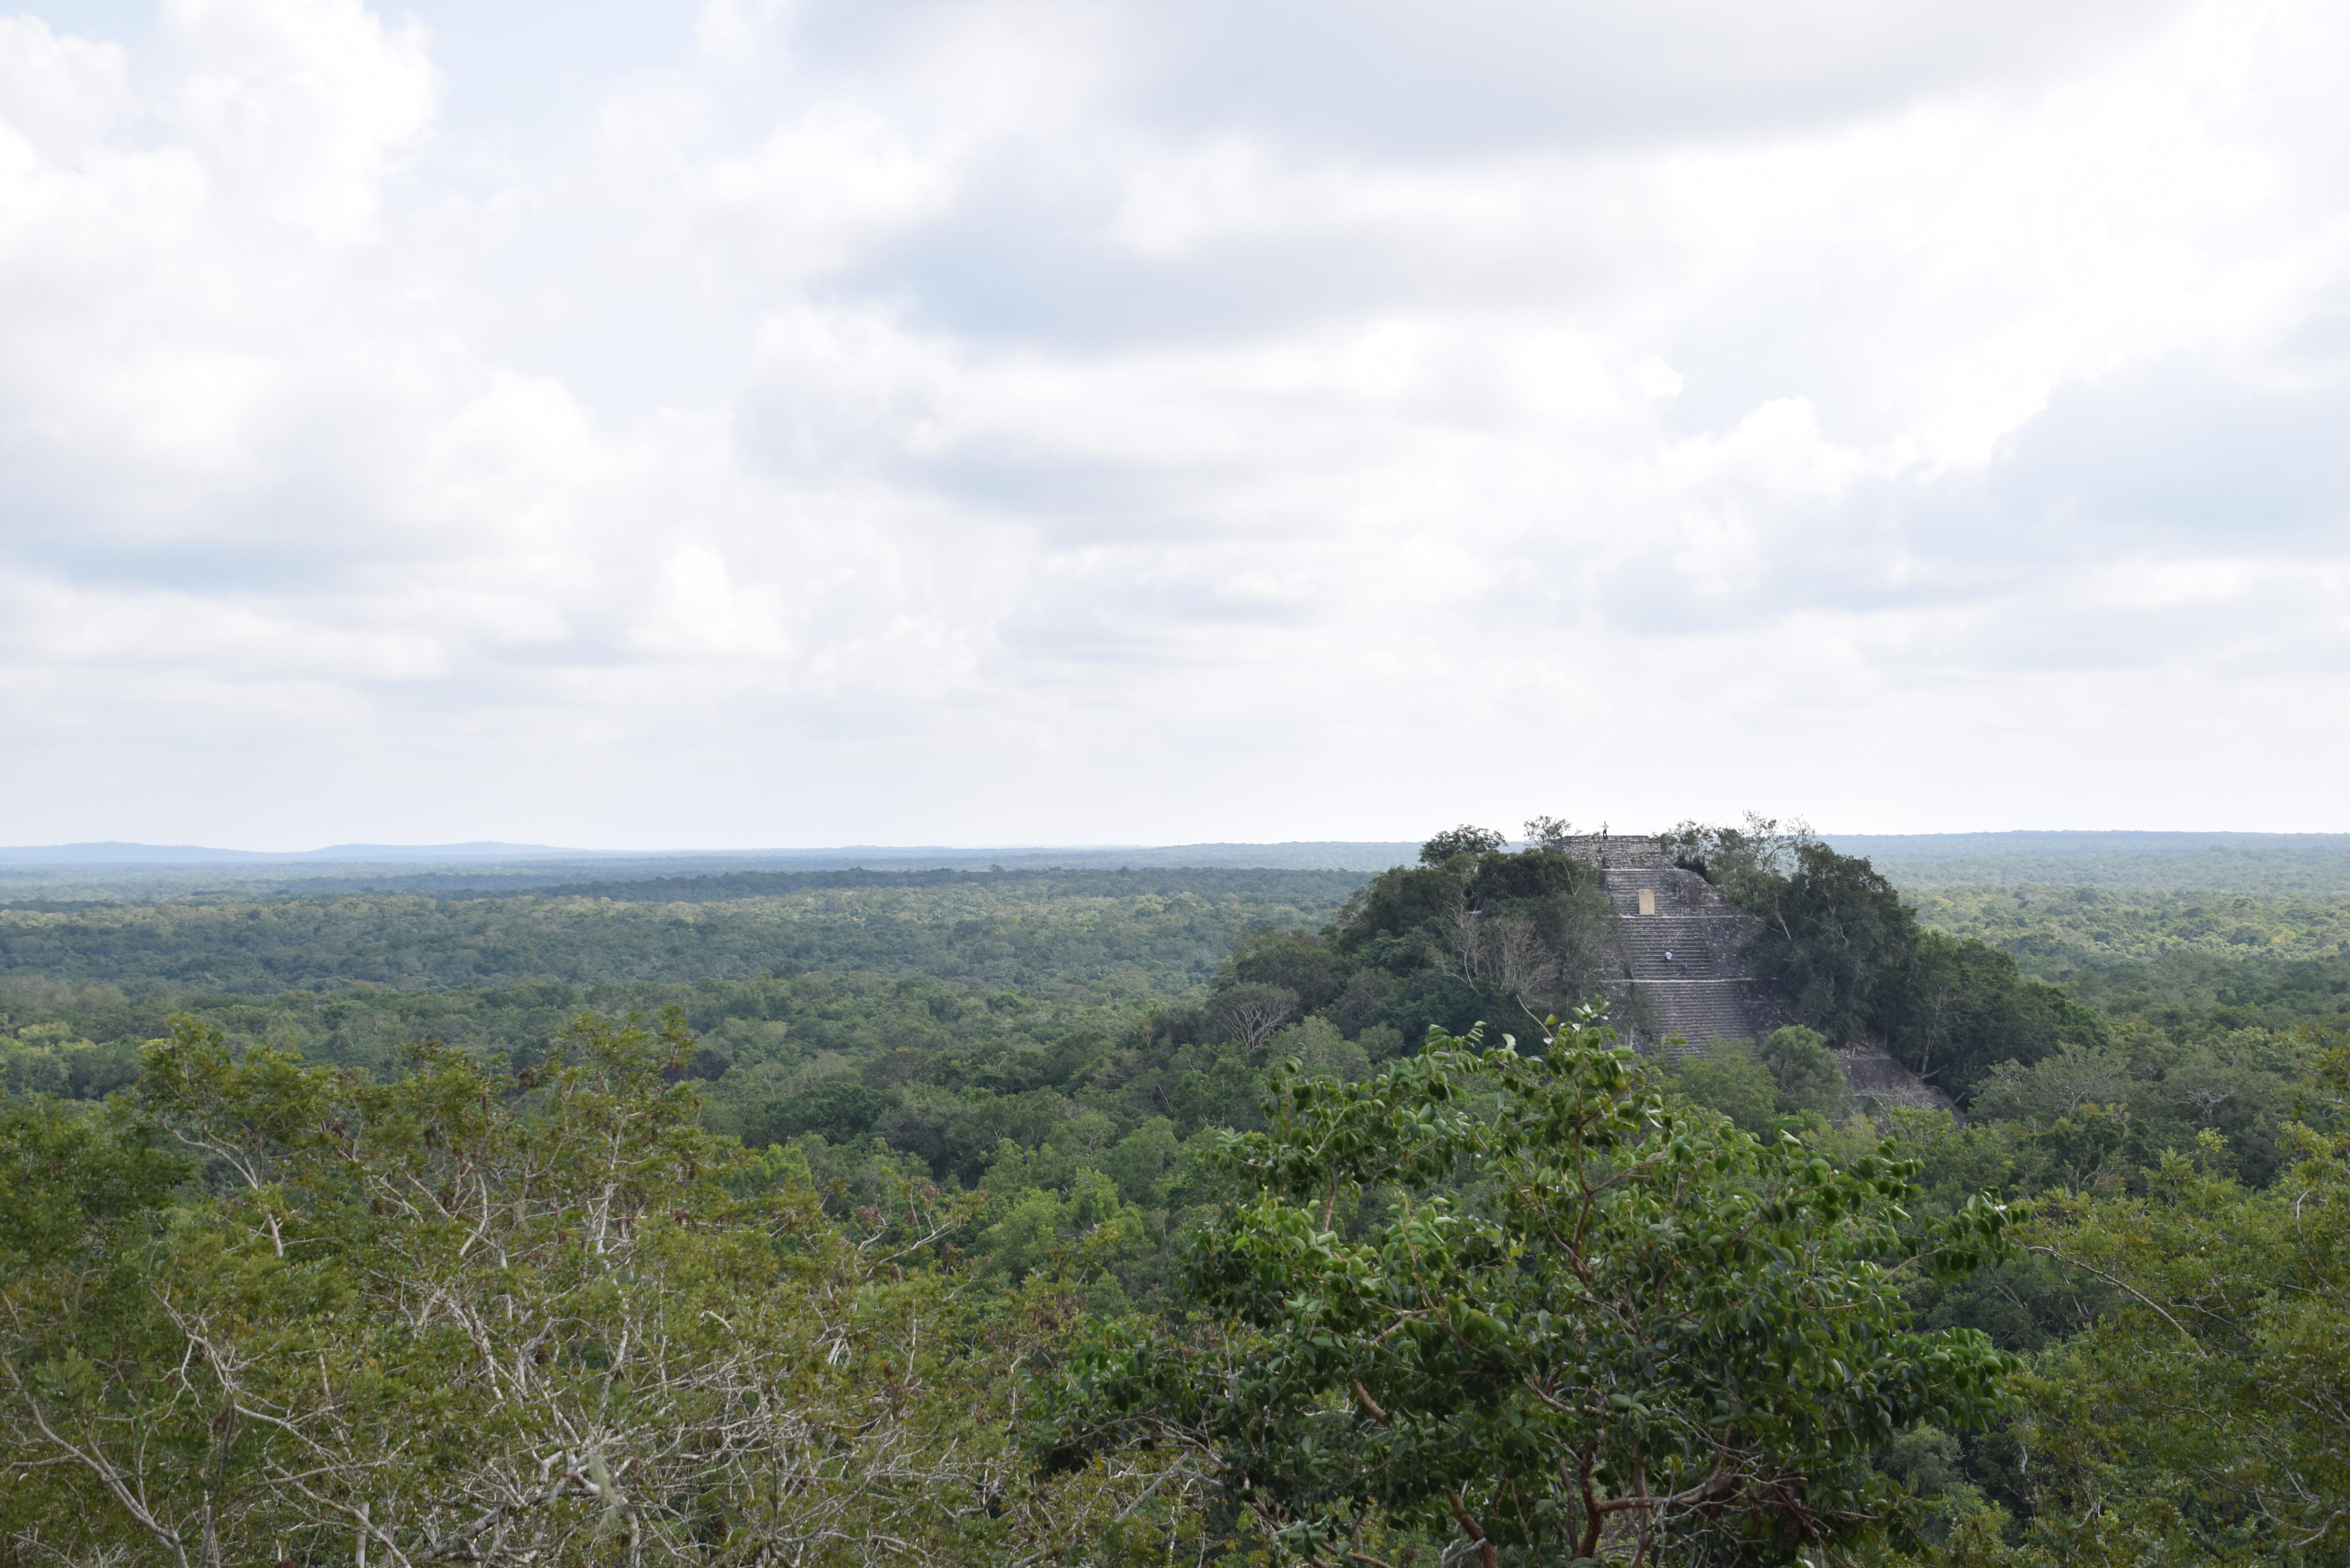 Yaxchilan et Calakmul: C'est l'aventure!